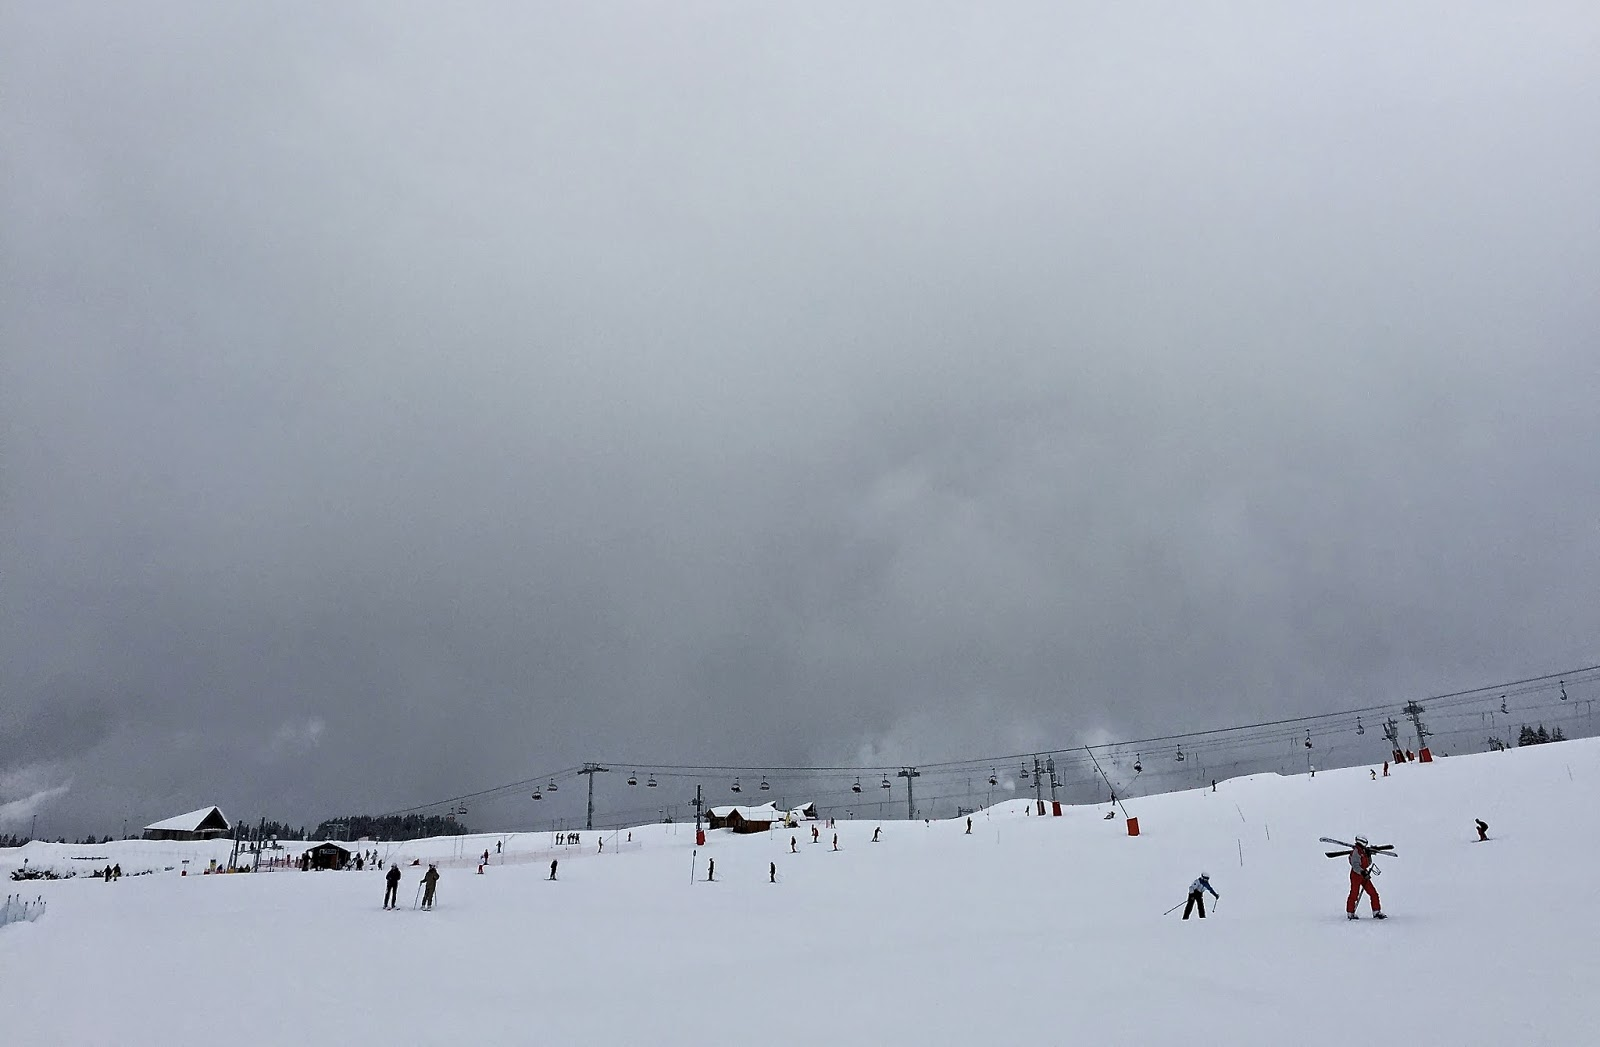 ski forfait Portes du soleil price prix precio pistas Suiza Francia